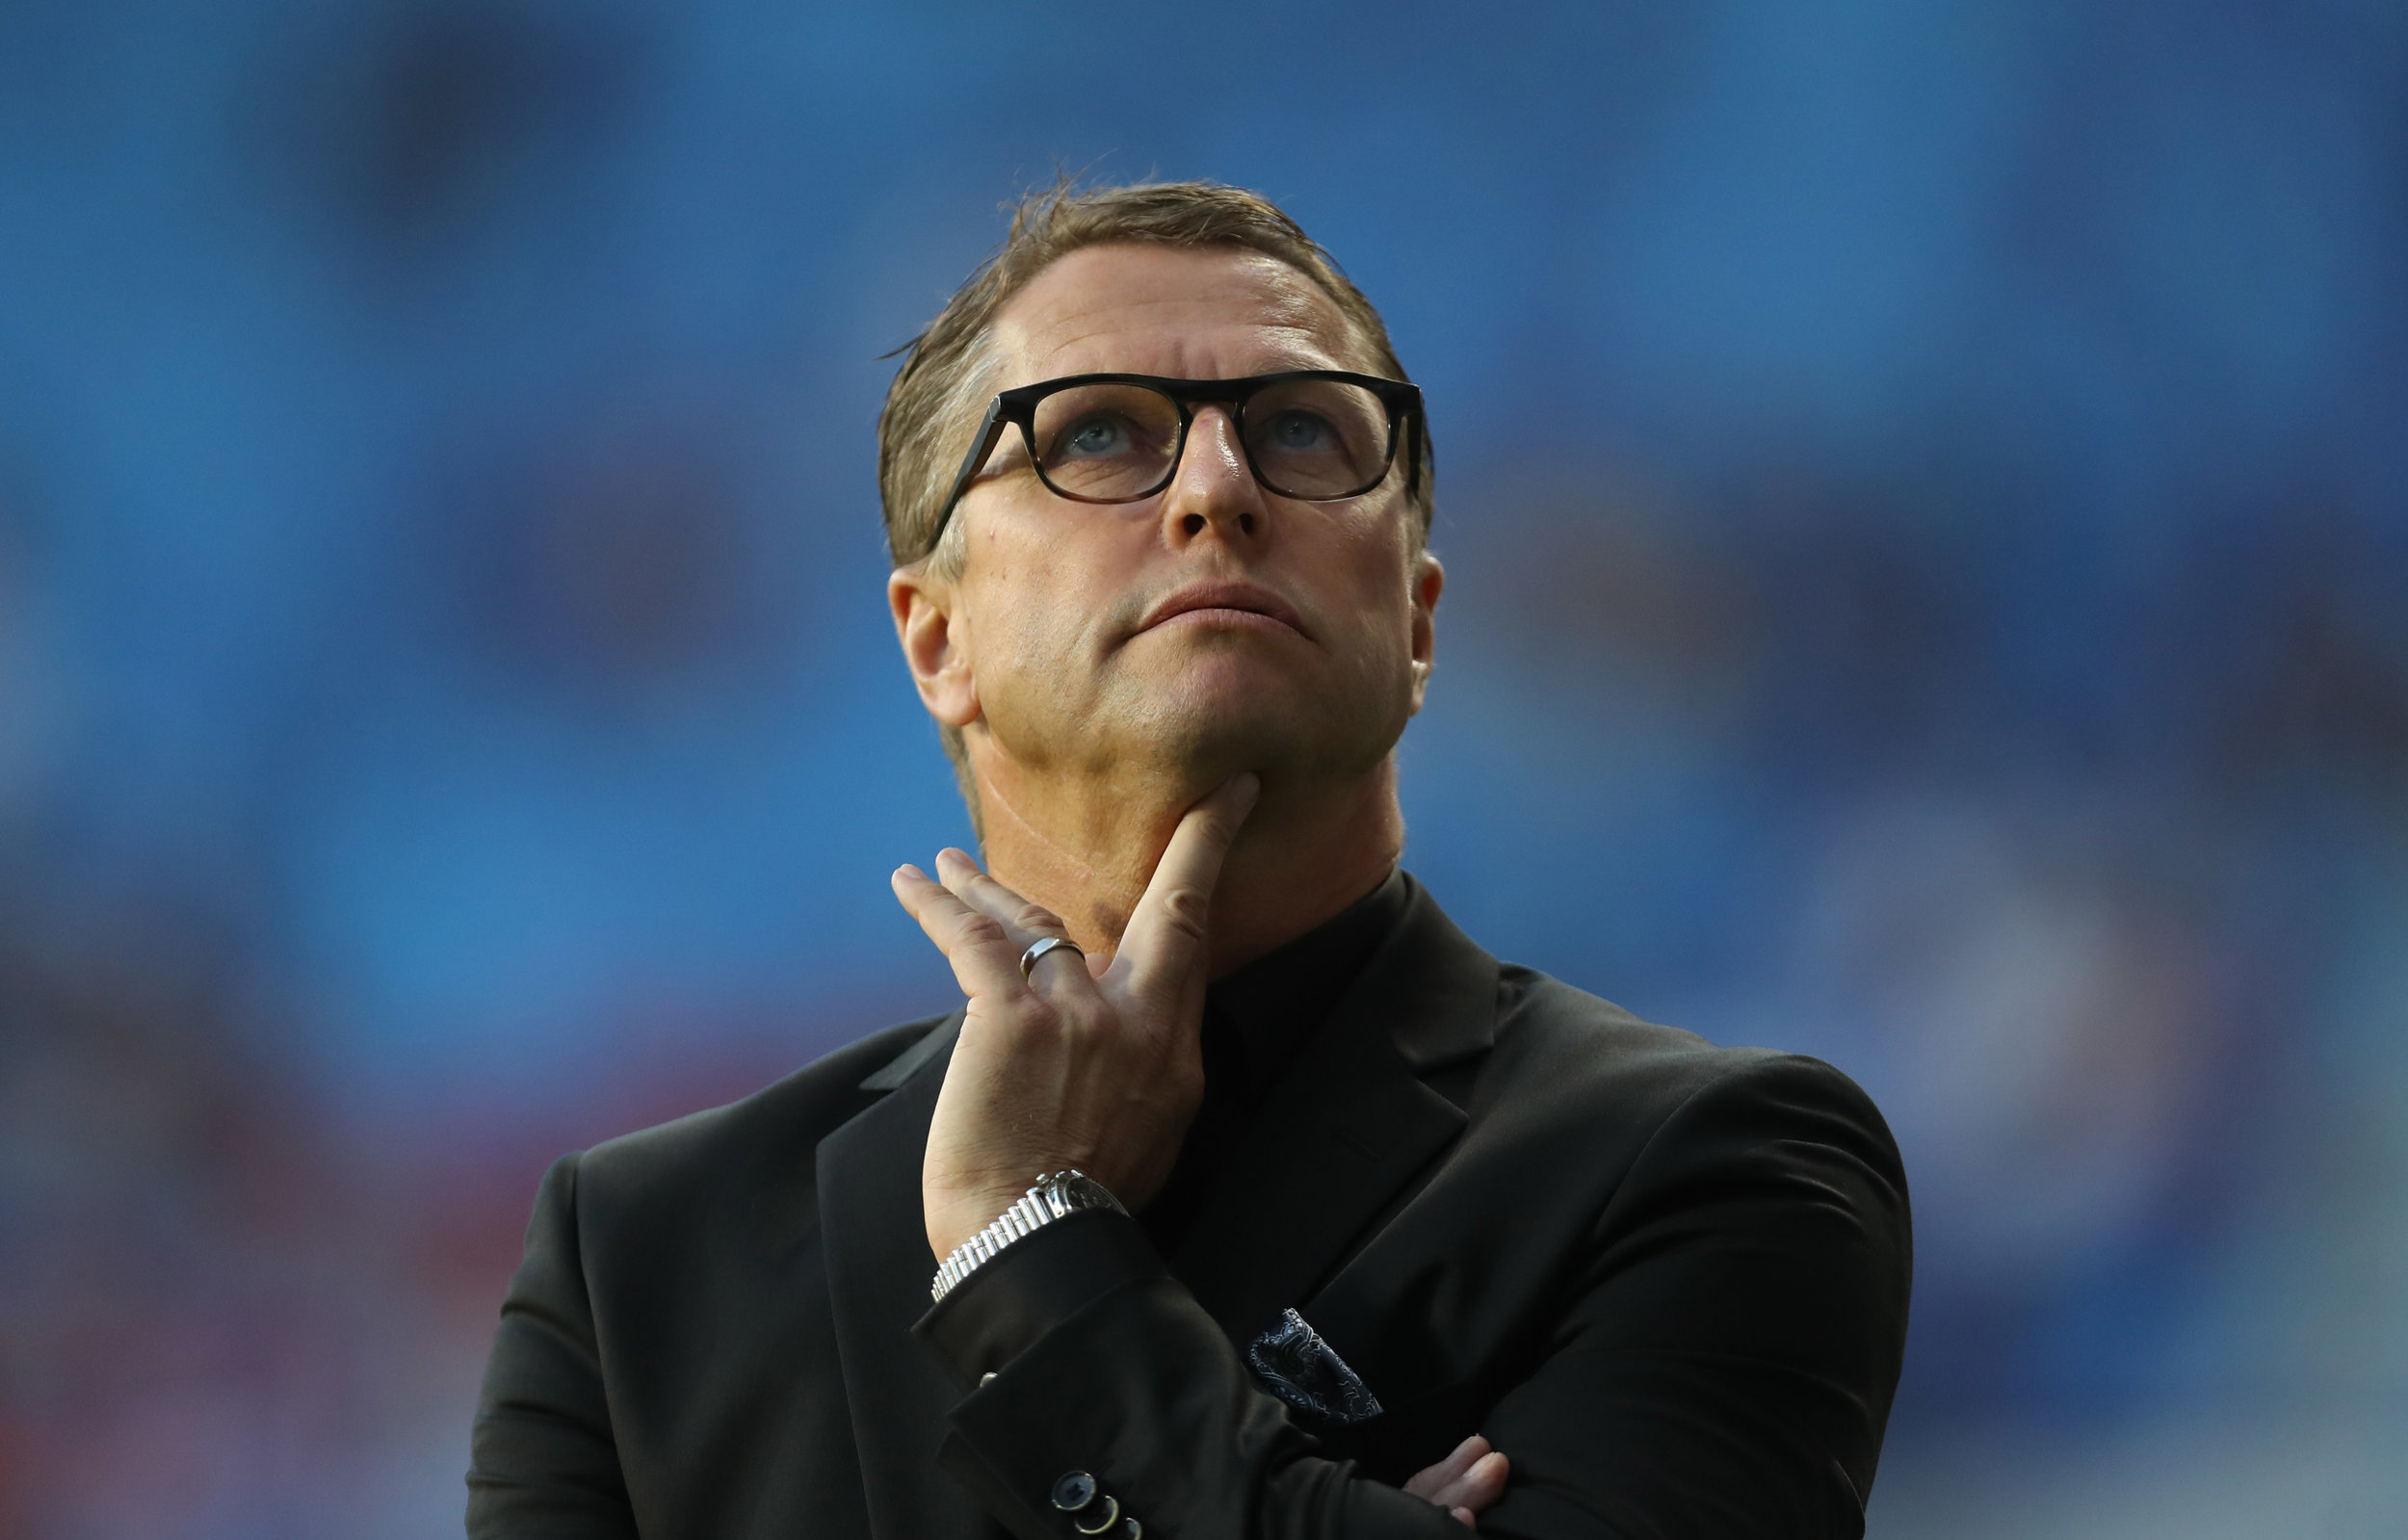 Vital Borkelmans, can lead Jordan in their progress (Asian Football Confederation (AFC))